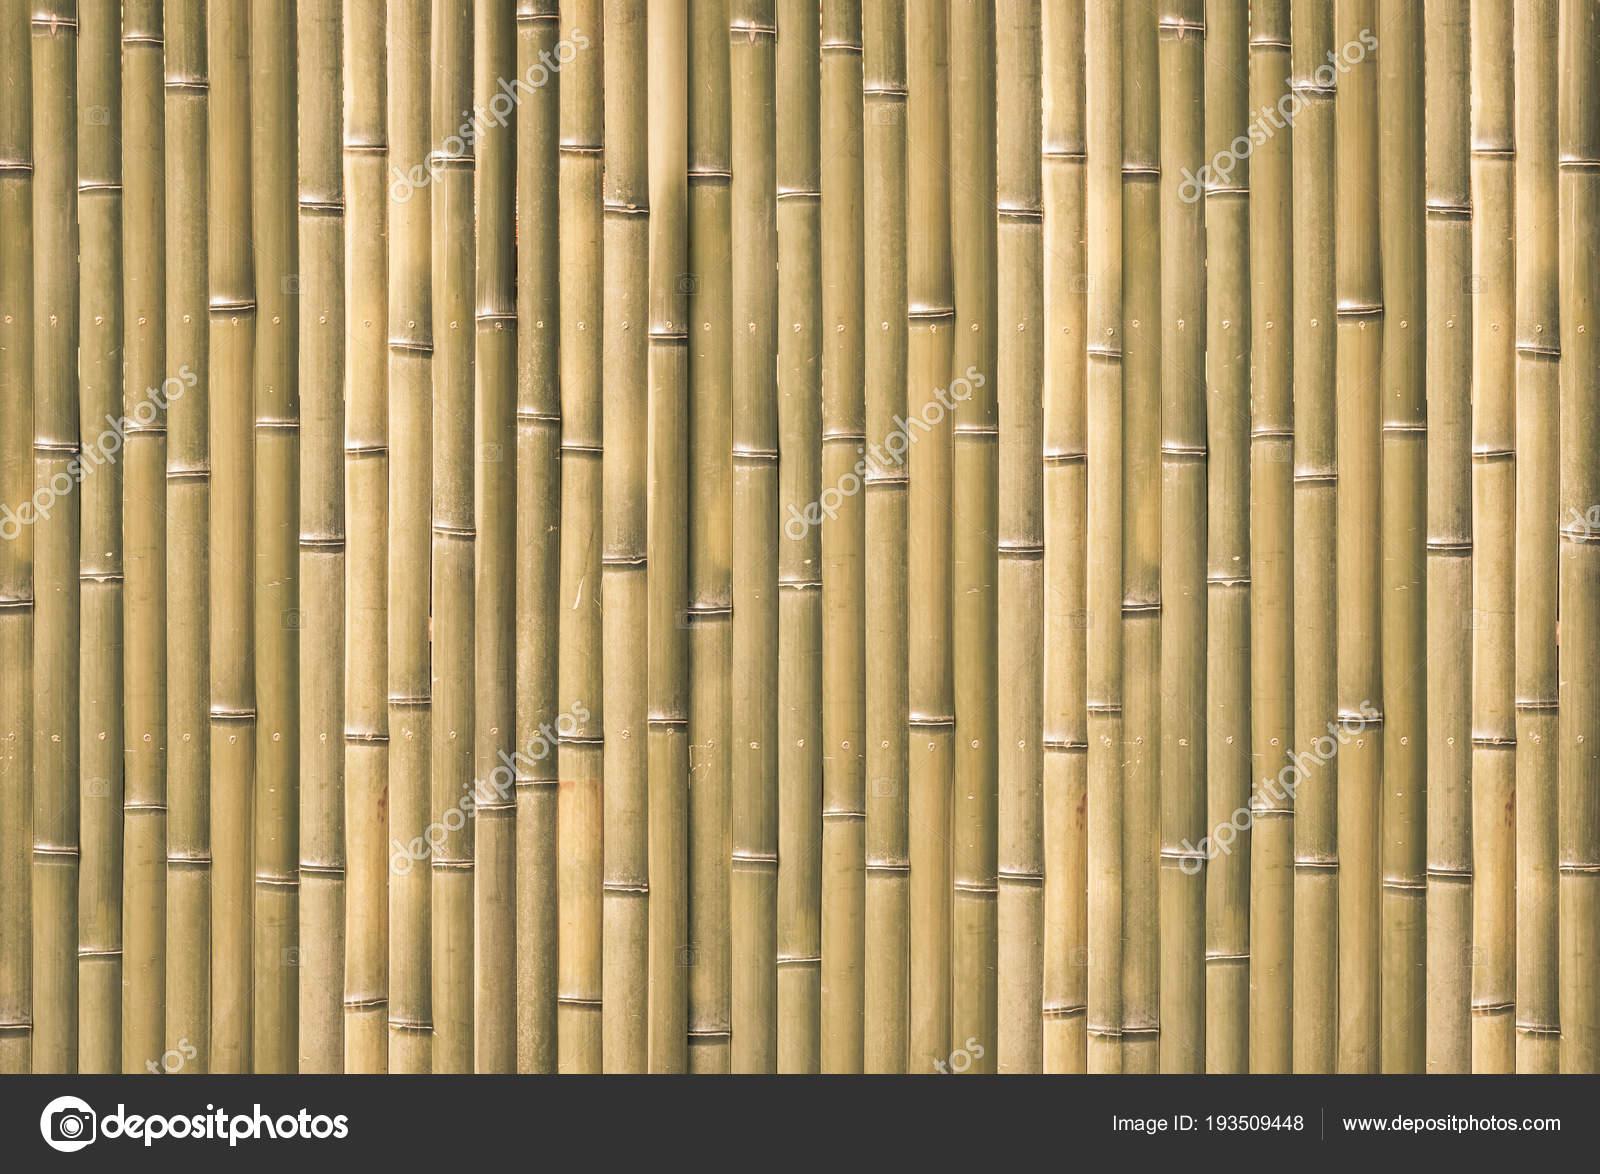 wood fence texture seamless. Wooden Bamboo Fence Pattern Seamless Background \u2014 Stock Photo Wood Fence Texture Seamless K